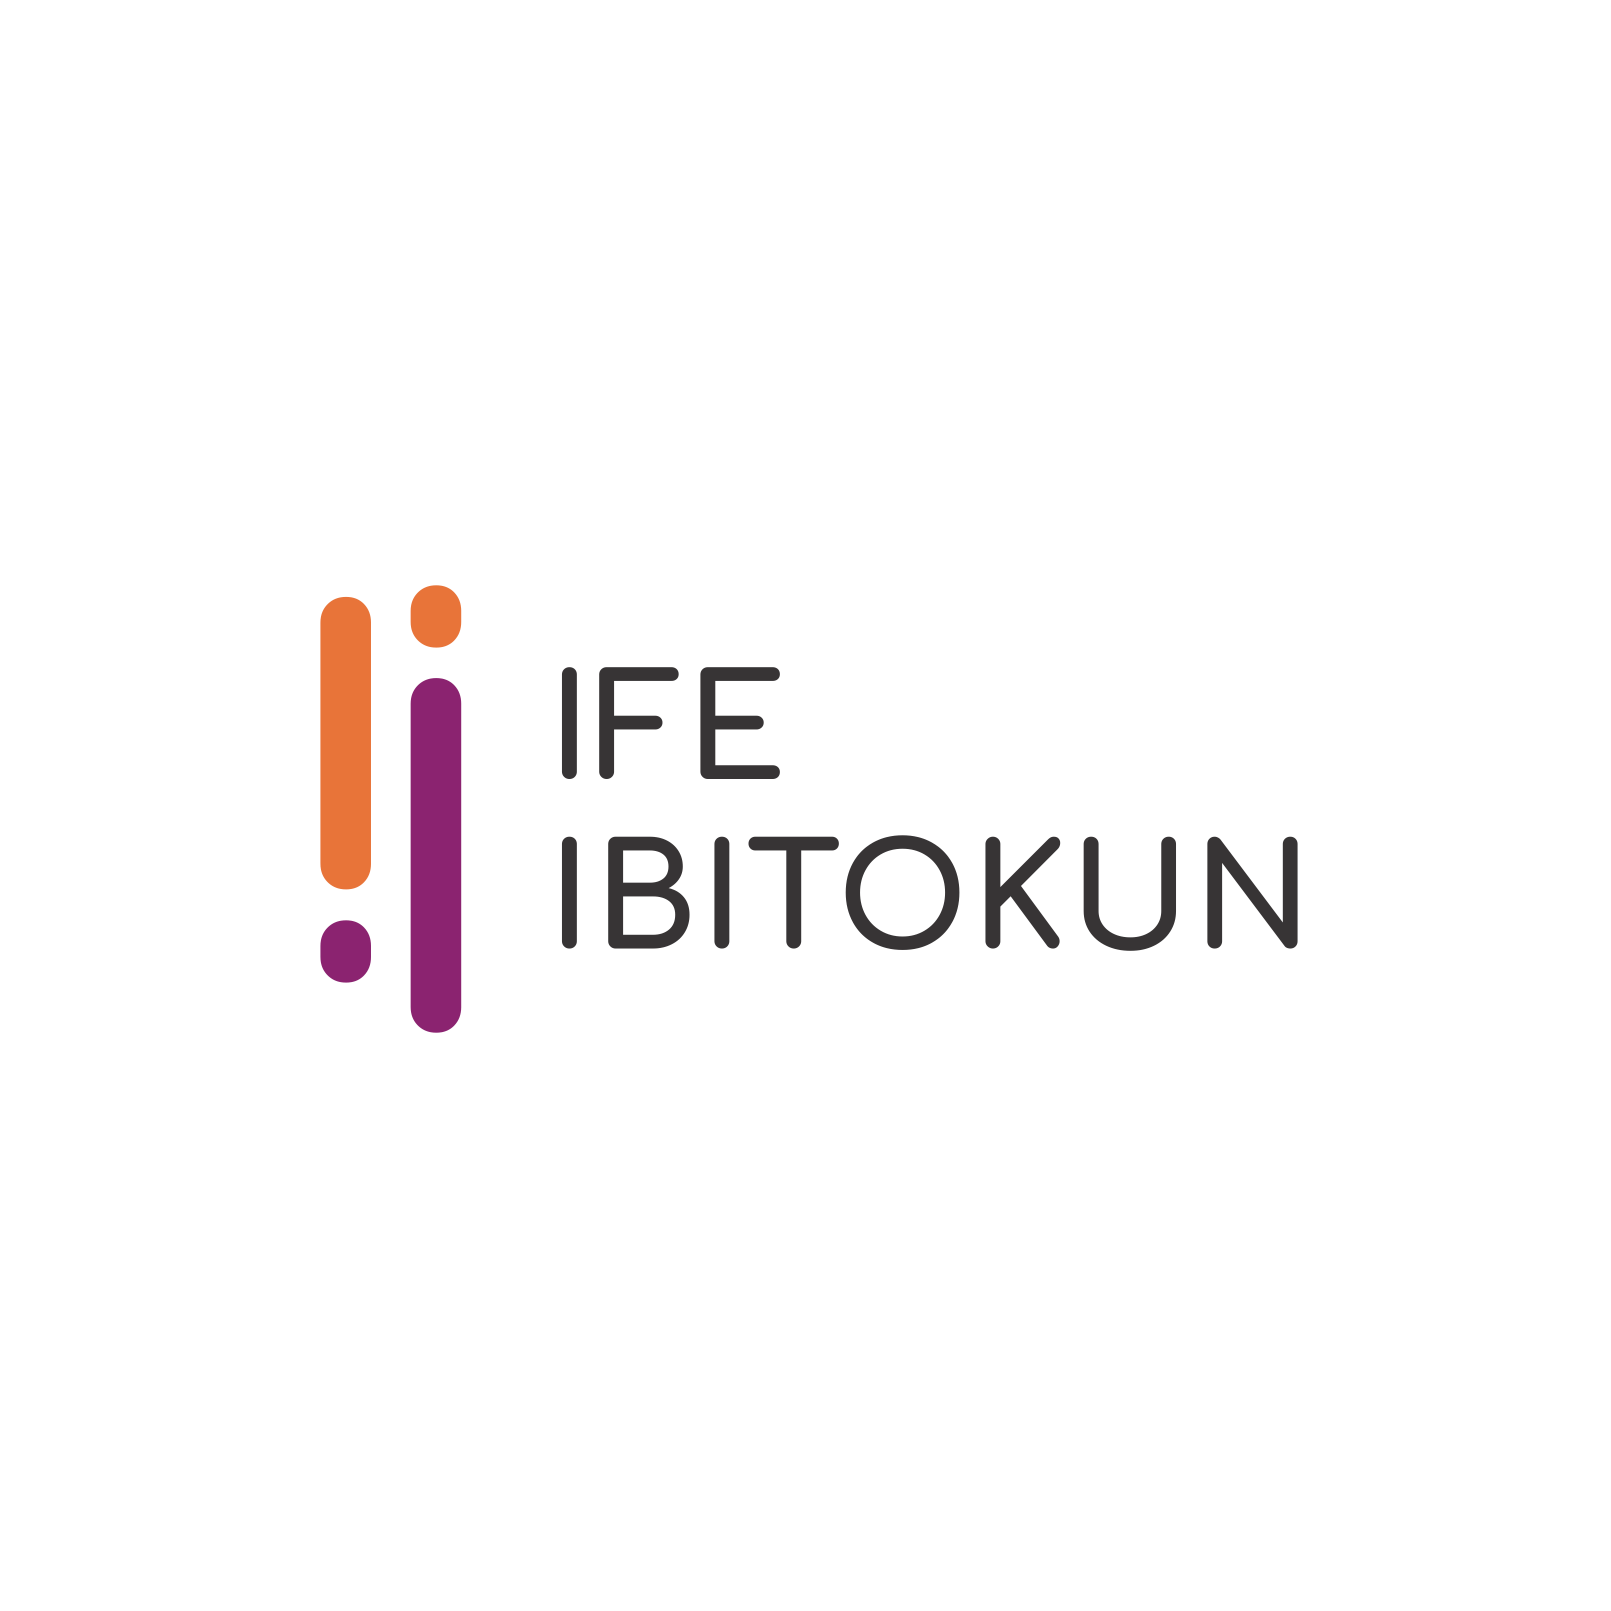 @ifeibitokun (ifeoluwakiitan_) Profile Image   Linktree